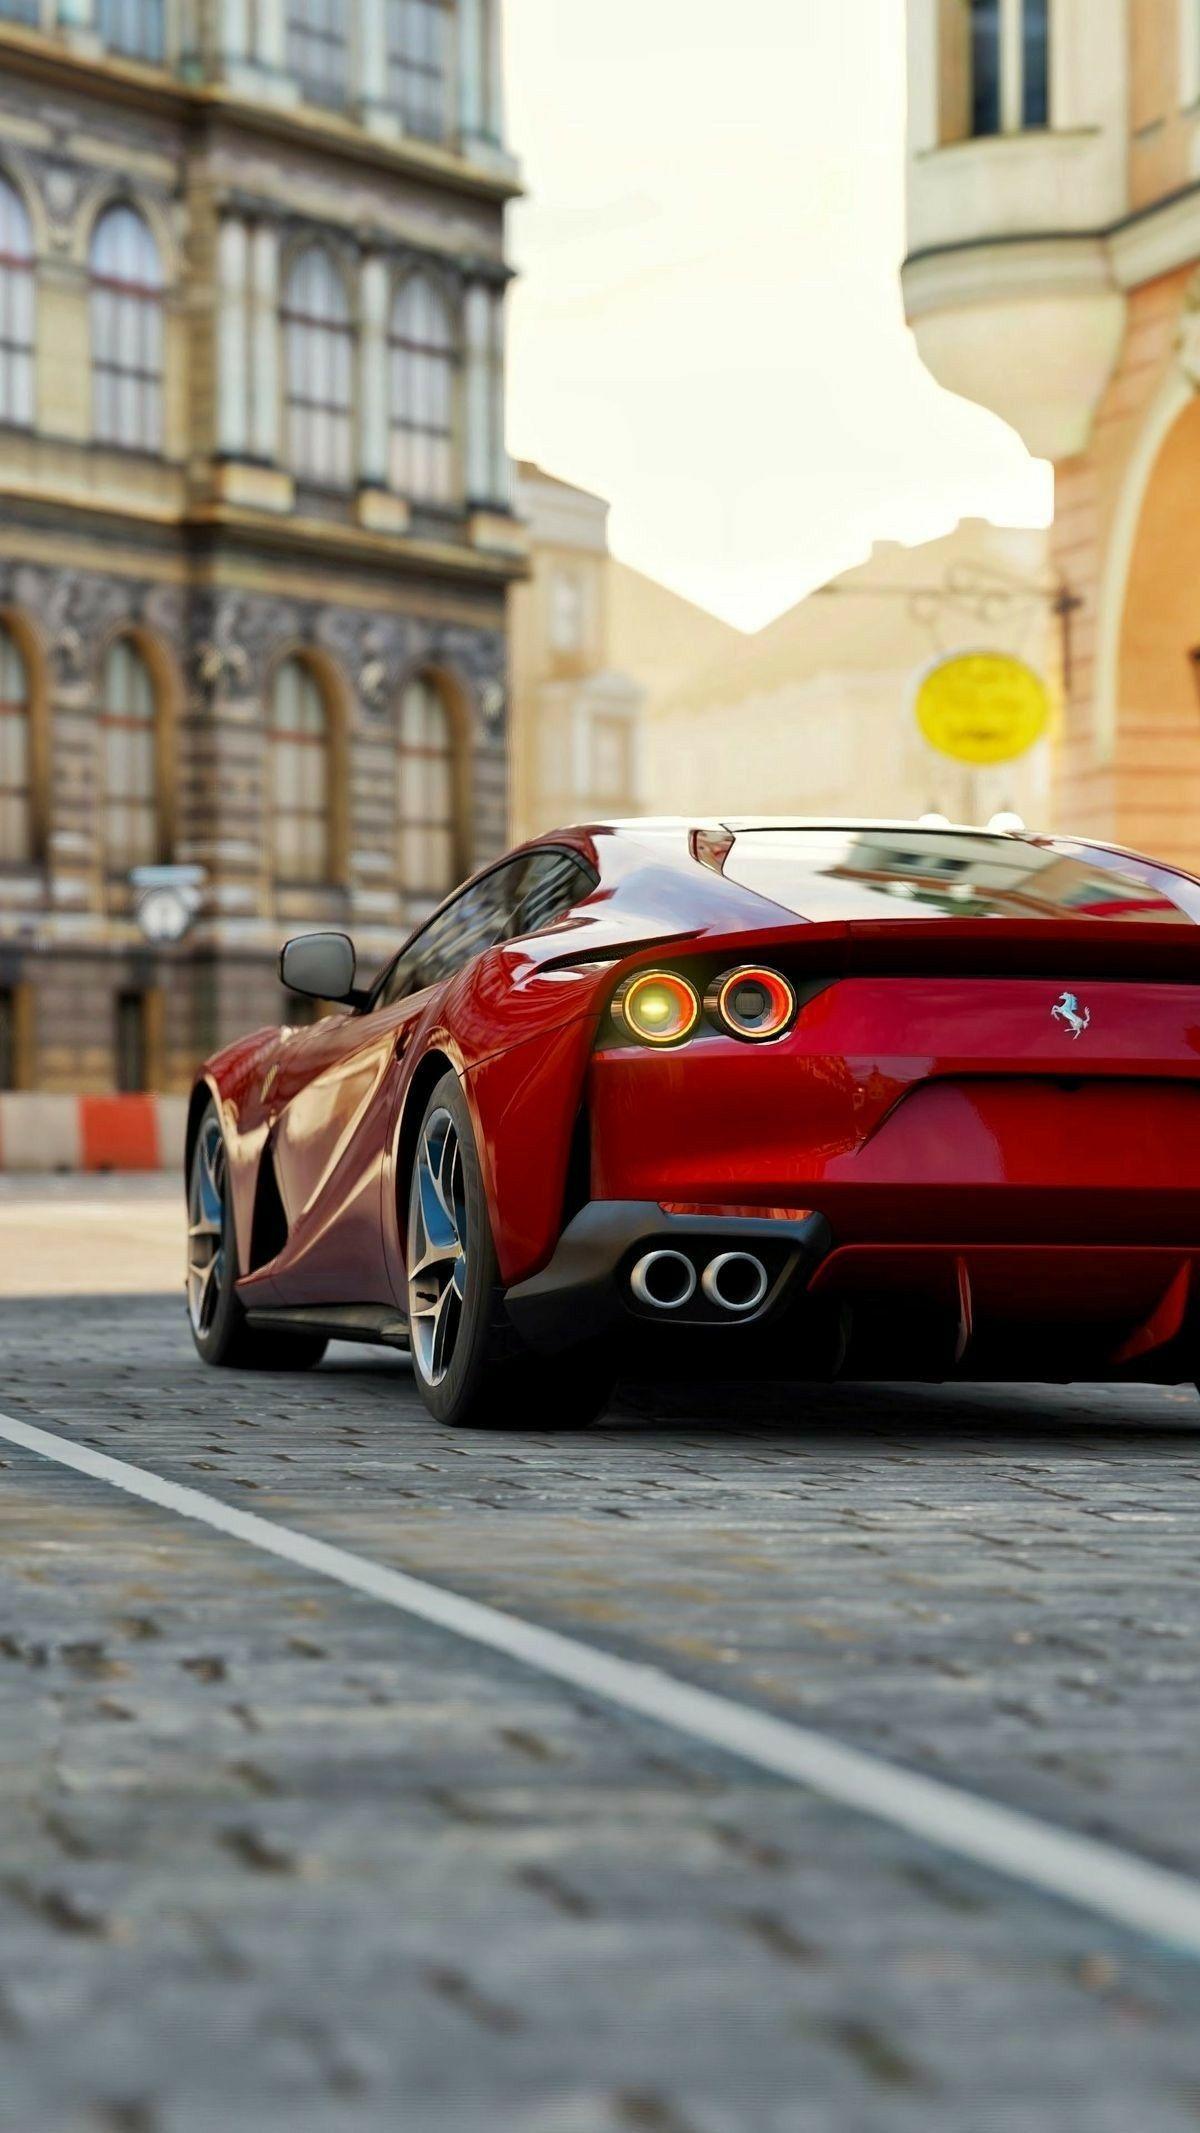 40,000+ Best Car Wallpapers Photos · 100% Free Download · Pexels...